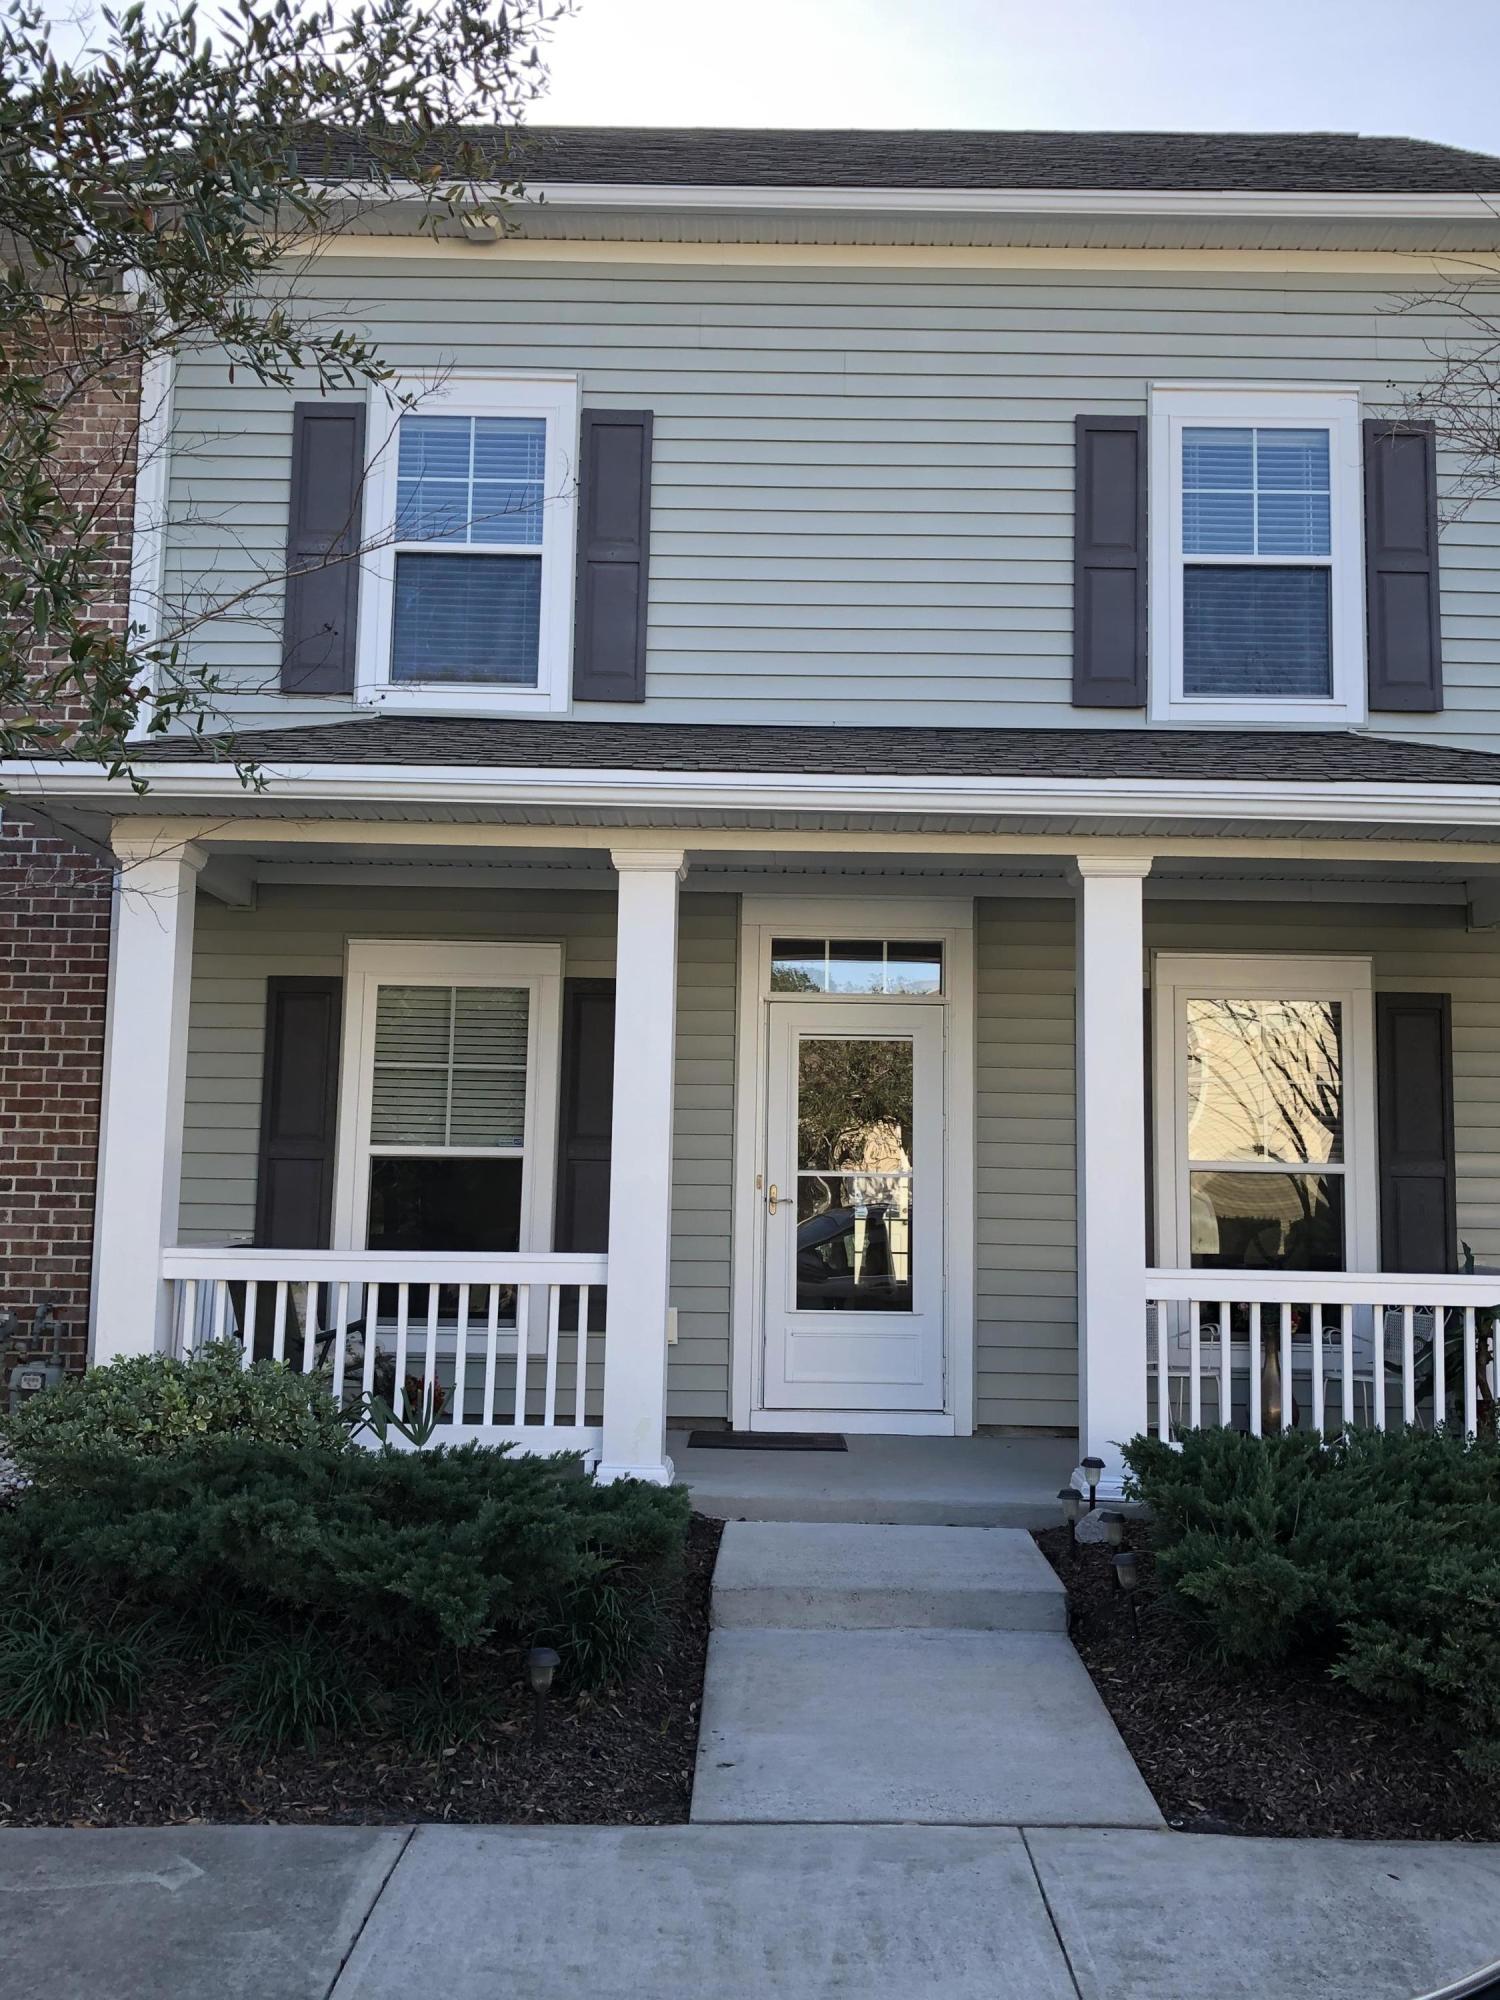 Boltons Landing Homes For Sale - 1445 Nautical Chart, Charleston, SC - 36